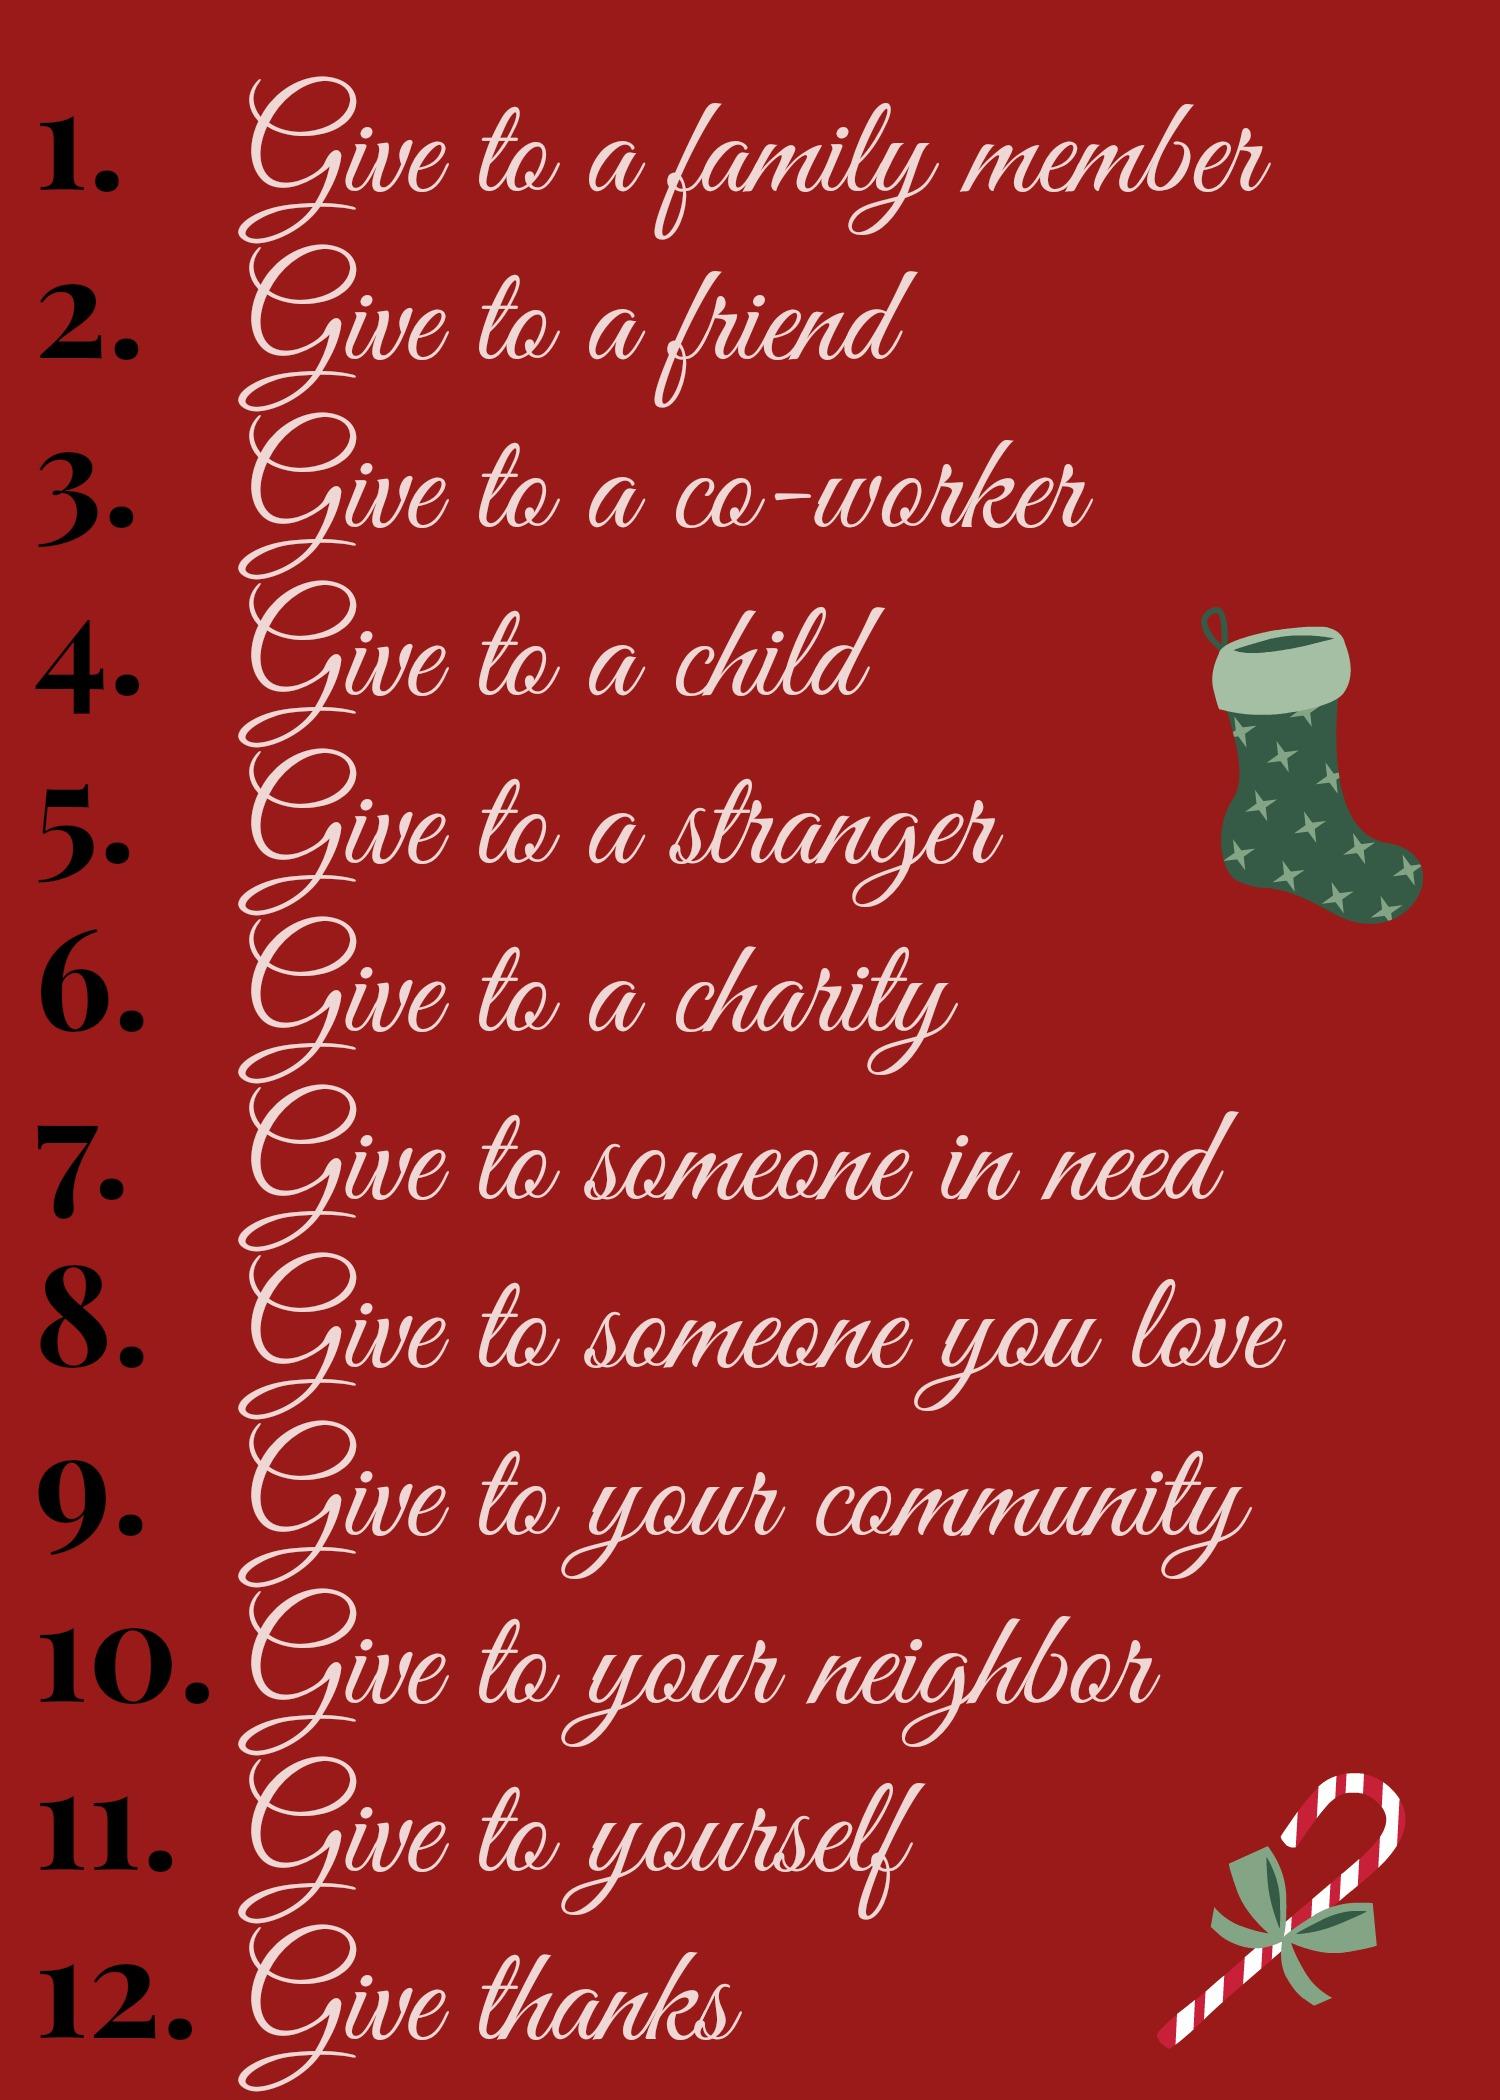 Givinglist